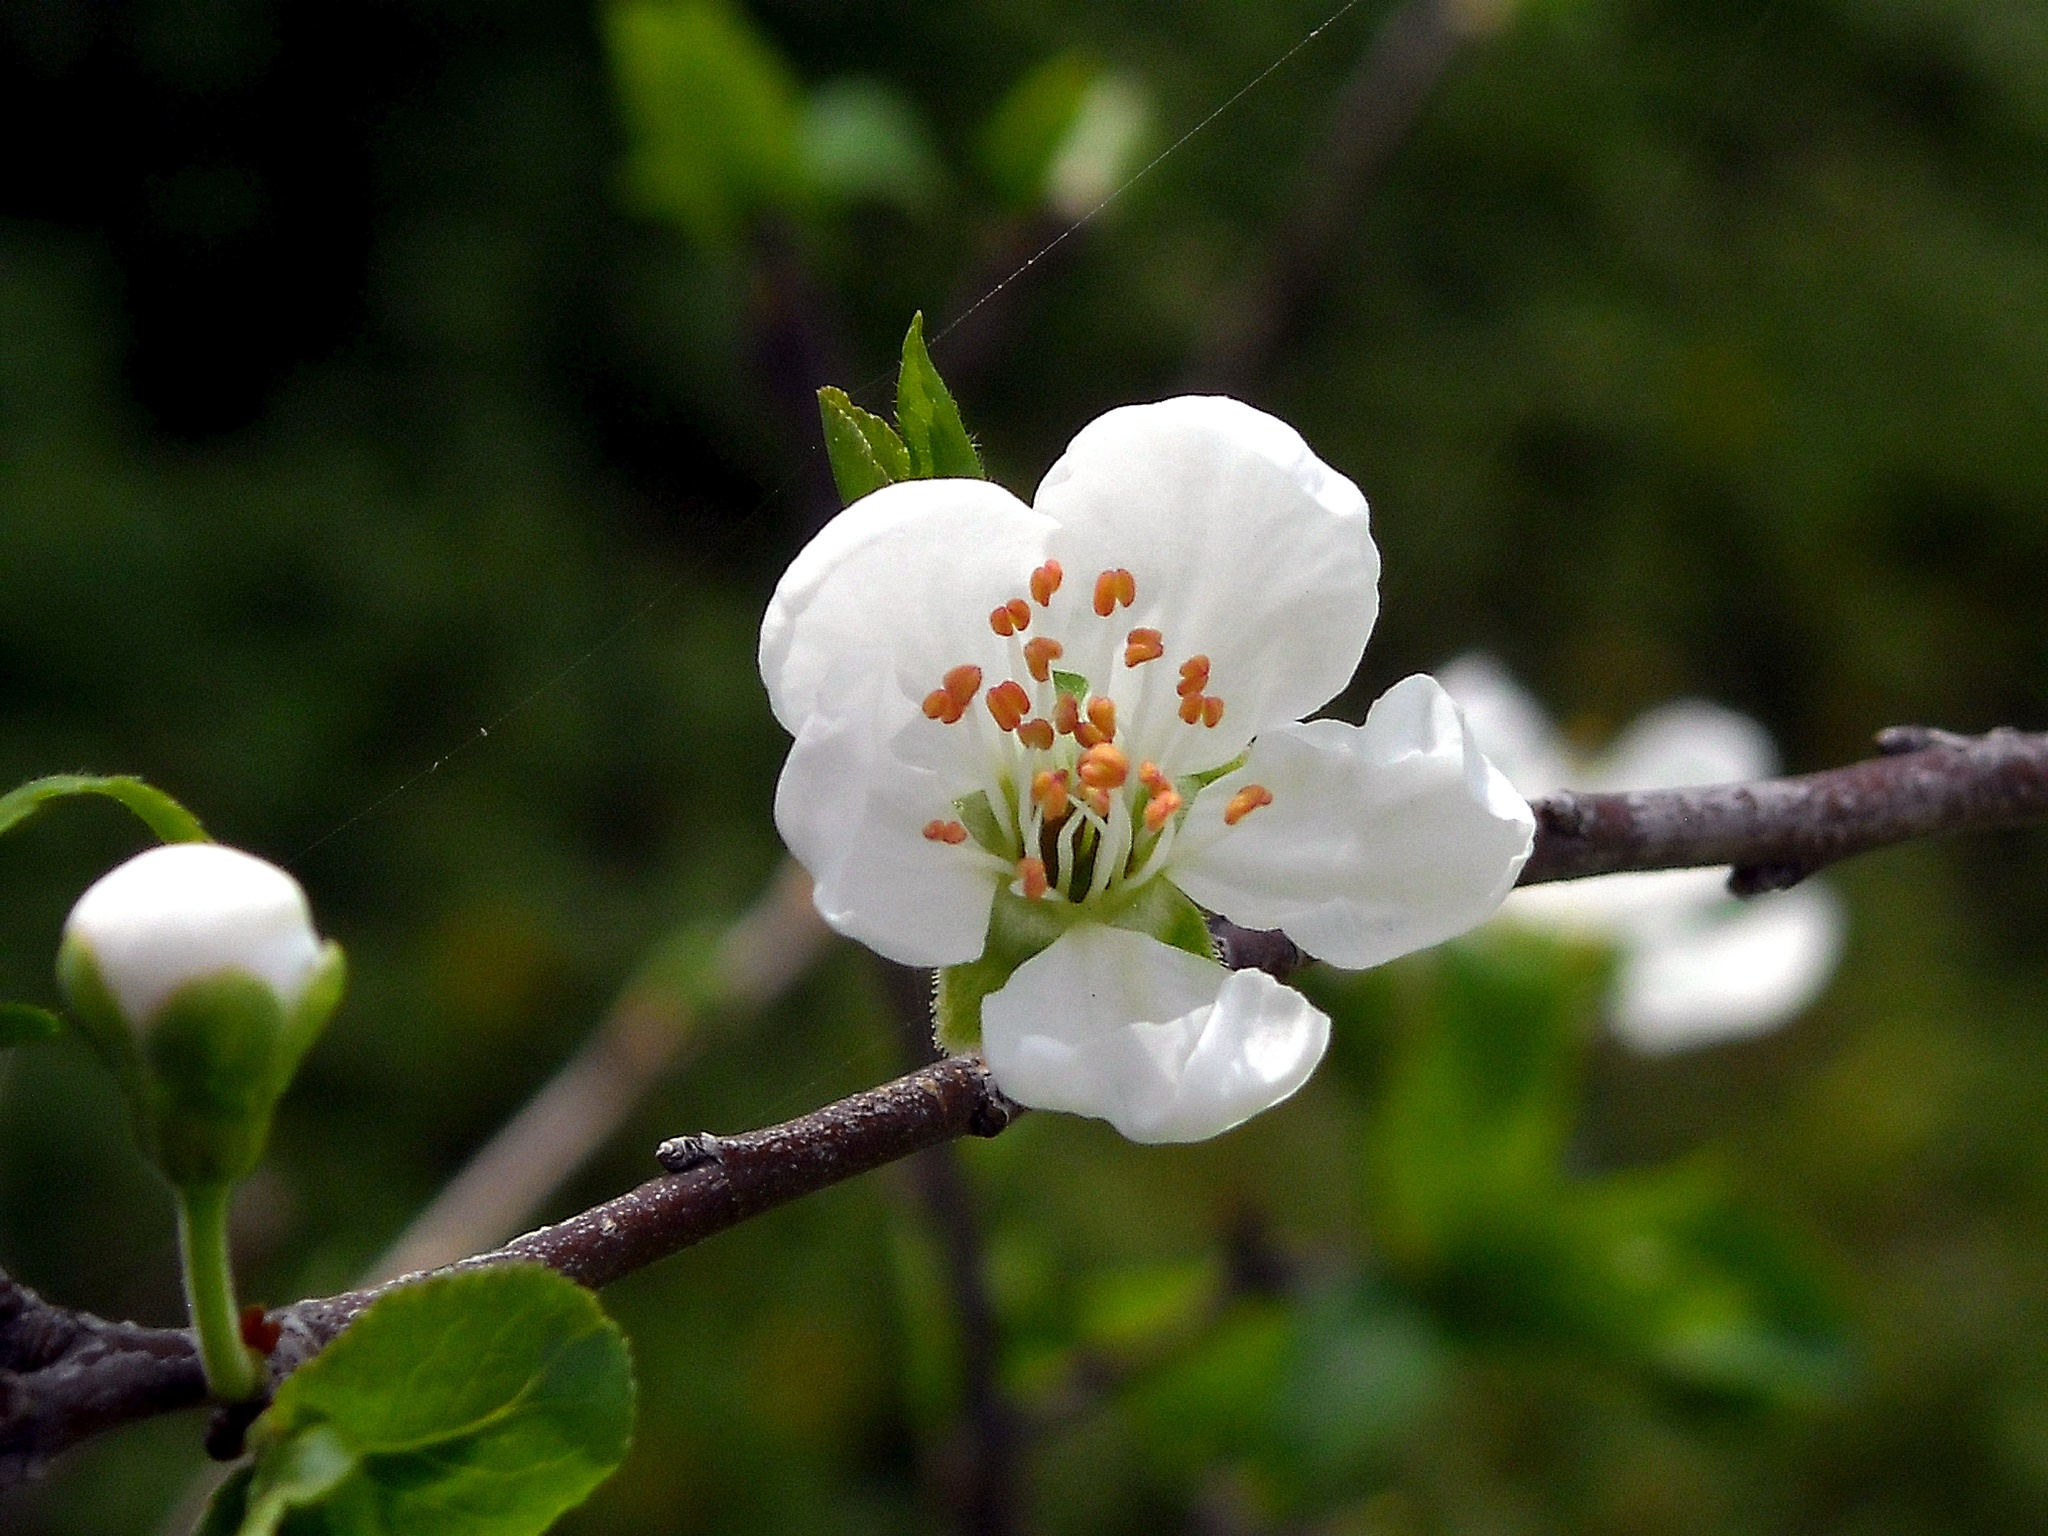 FIRST FLOWER OF GREEN PLUM, MY BACKYARD by Akin Saner